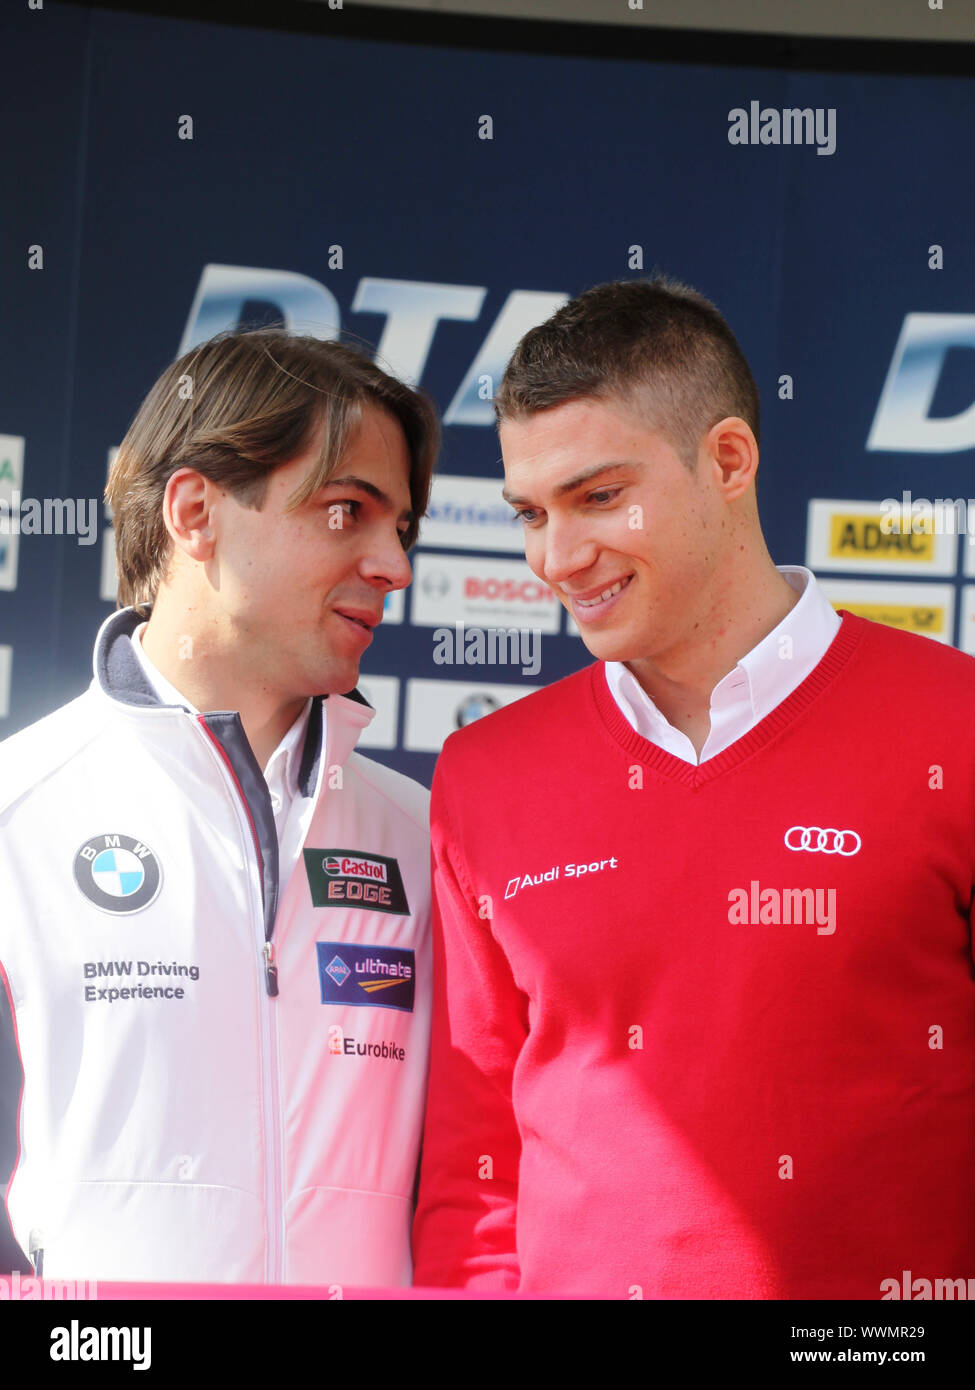 DTM-Rennfahrer Augusto Farfus (BMW),Eduardo Mortara (Audi) Pressekonferenz DTM 2014 in Braunschweig Stock Photo